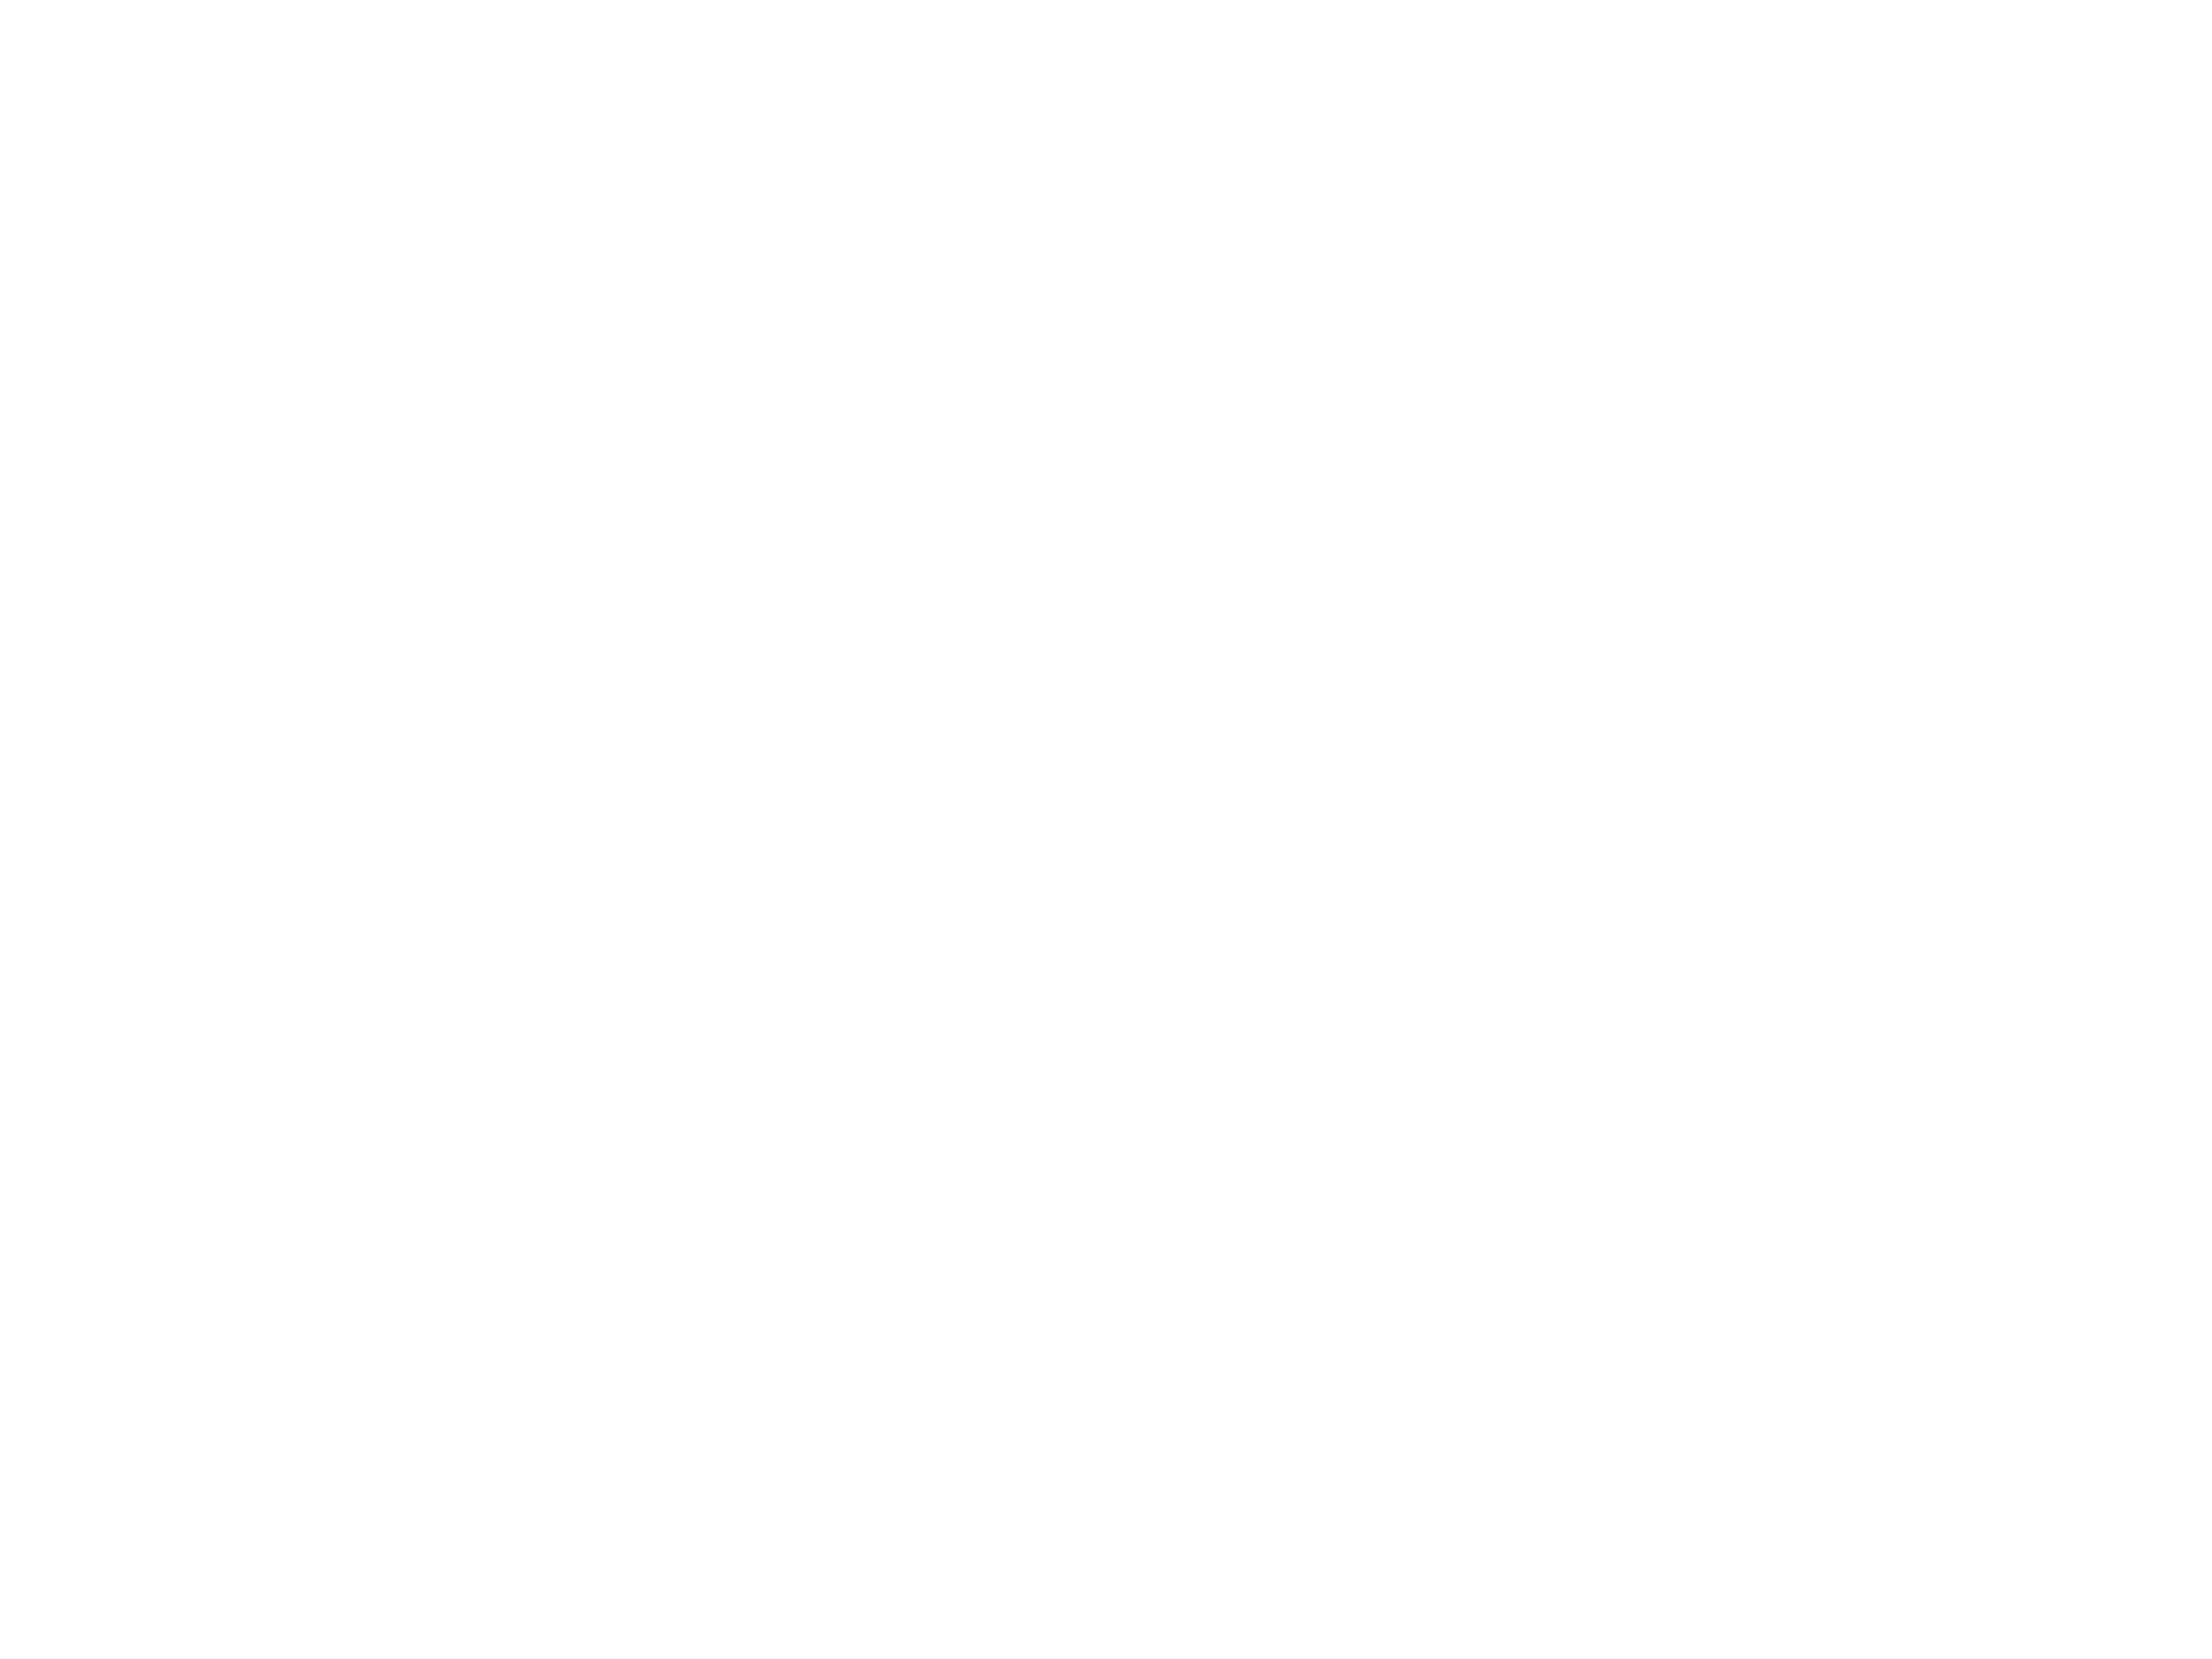 p1199237-hdr